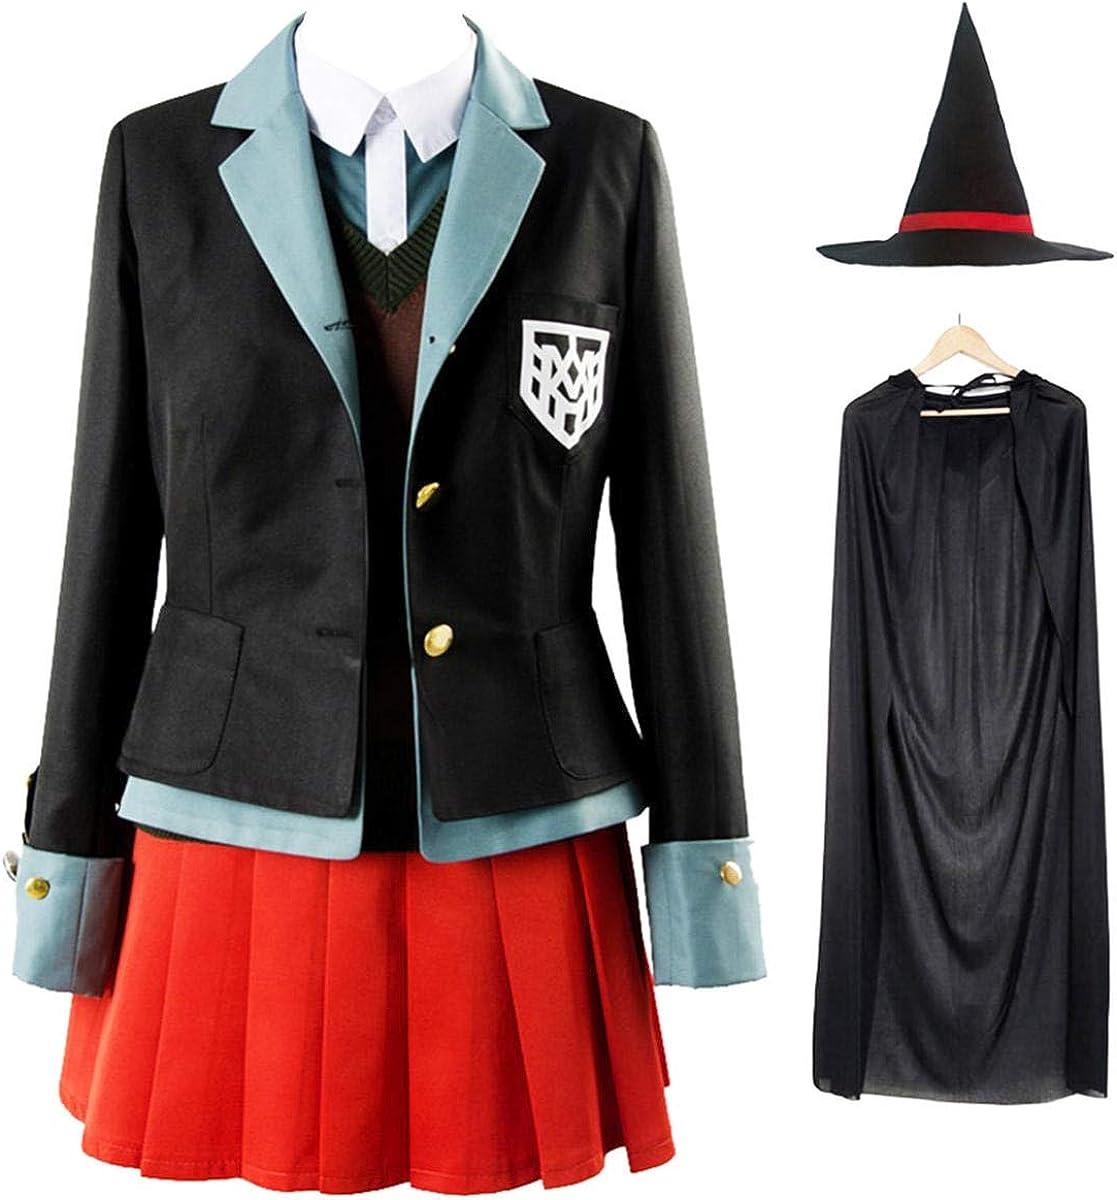 MIAOCOS Cheap bargain Yumeno Over item handling ☆ Himiko Cosplay Danganronpa Costume Dress Schoo JK